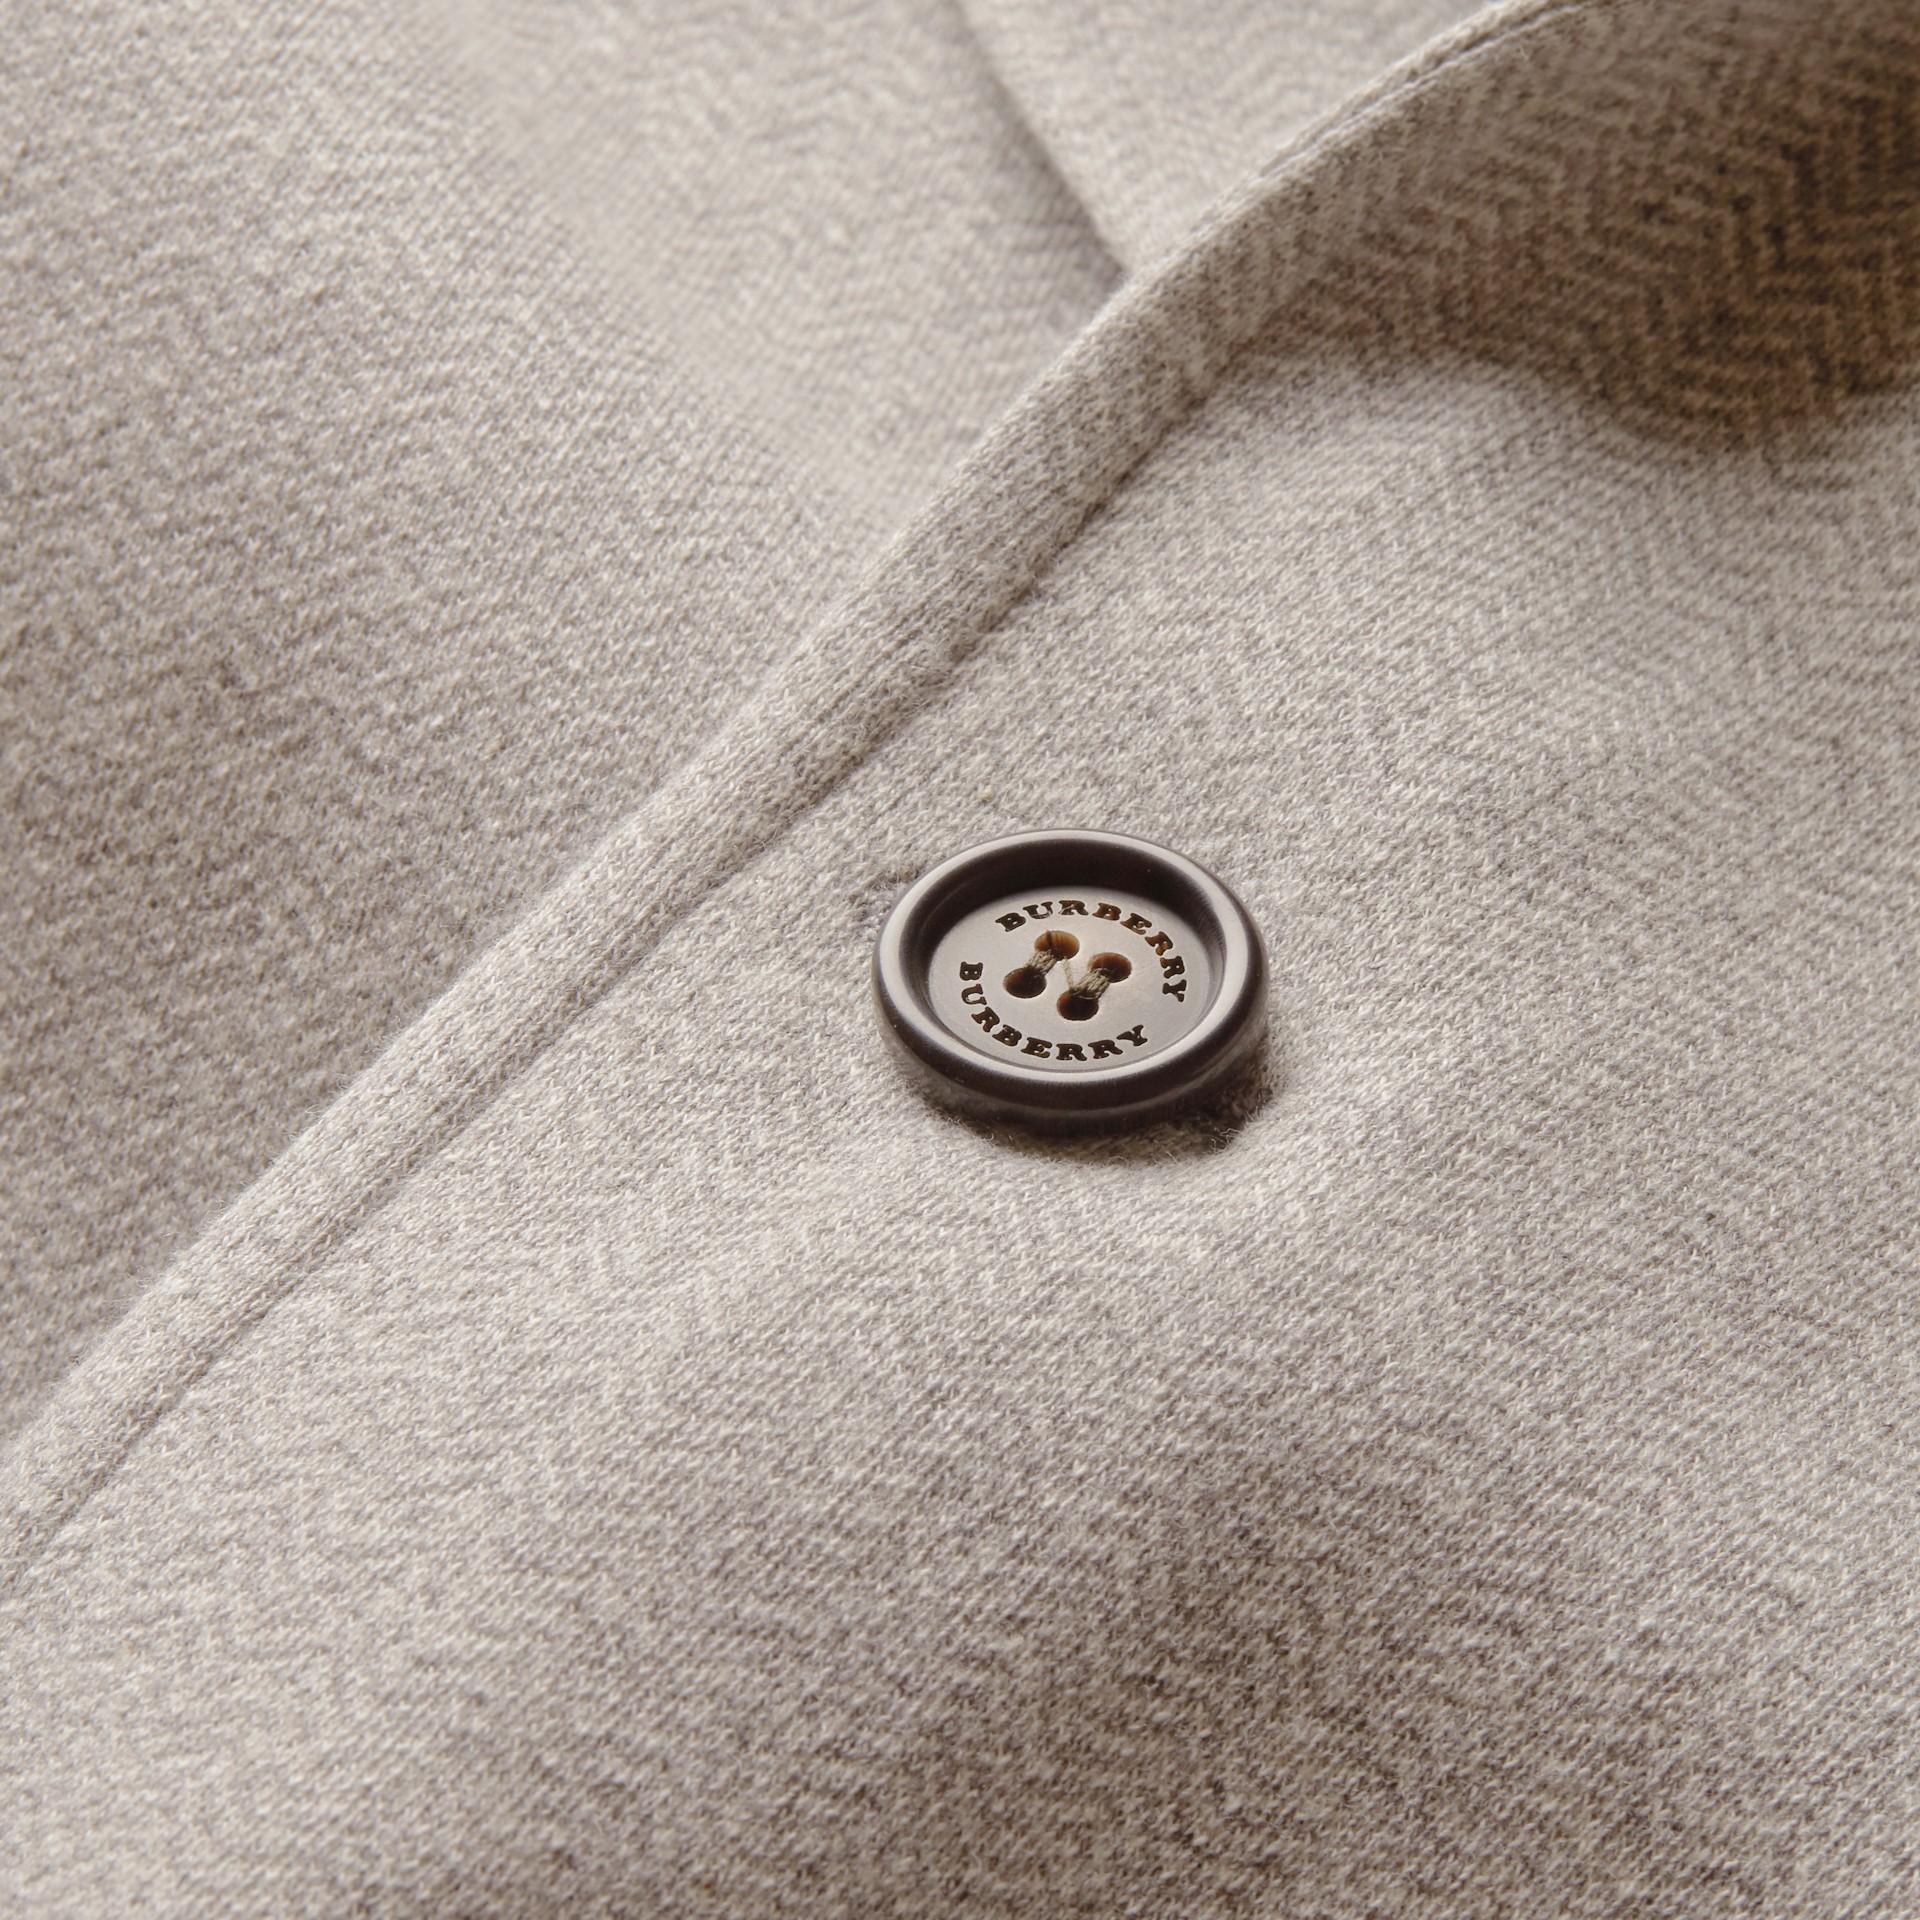 Herringbone Cotton Blend Jersey Blazer - gallery image 2